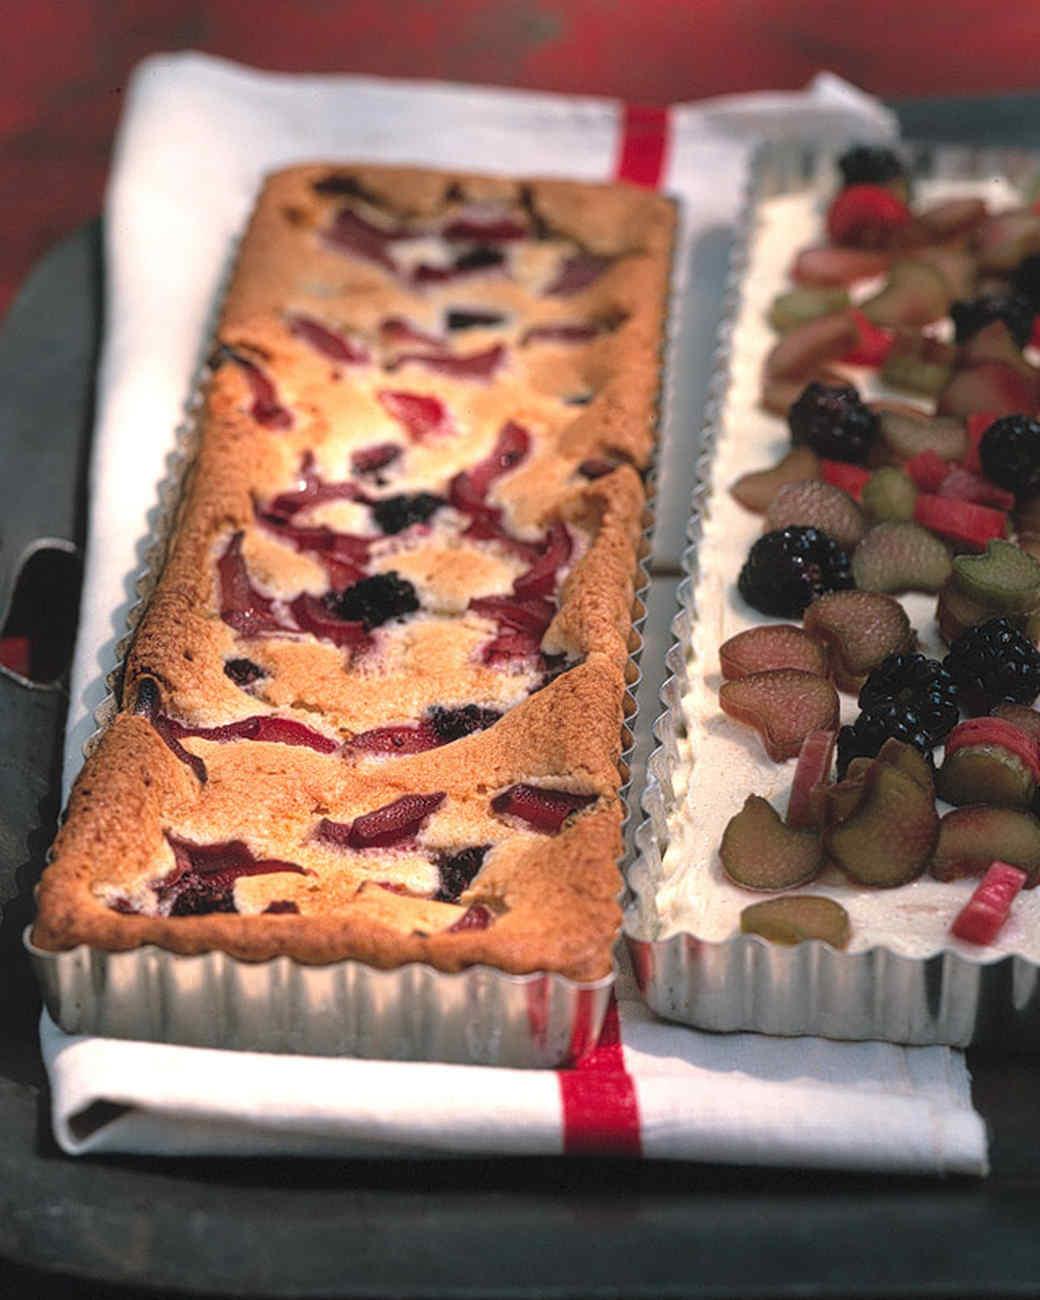 Rhubarb and Blackberry Snack Cake